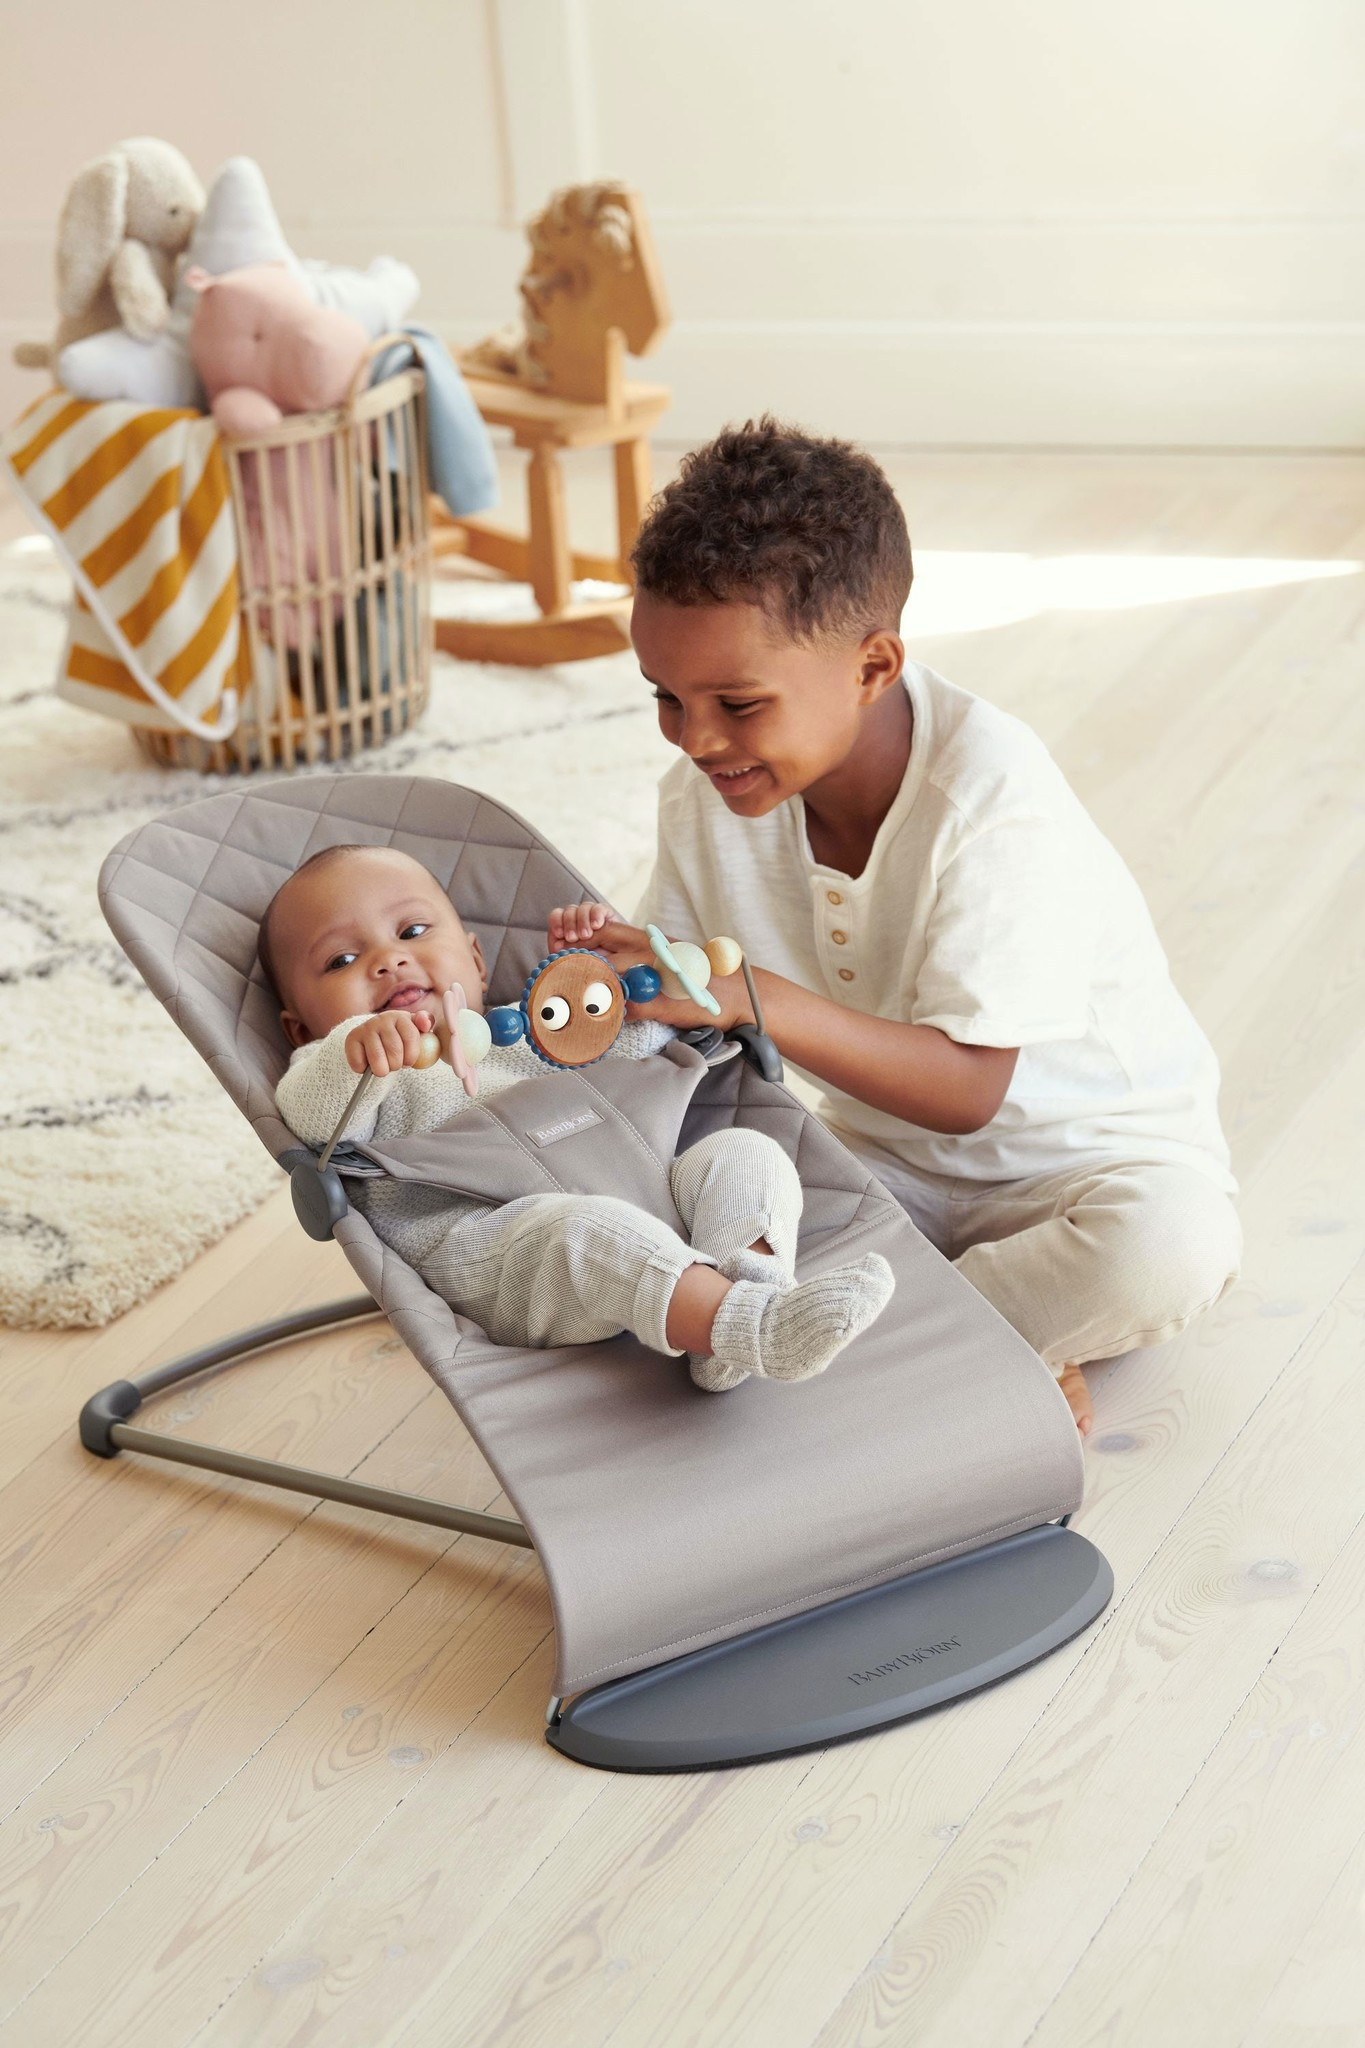 BABYBJÖRN BABYBJÖRN Speelgoed voor Wipstoeltje Ondeugende oogjes pastel